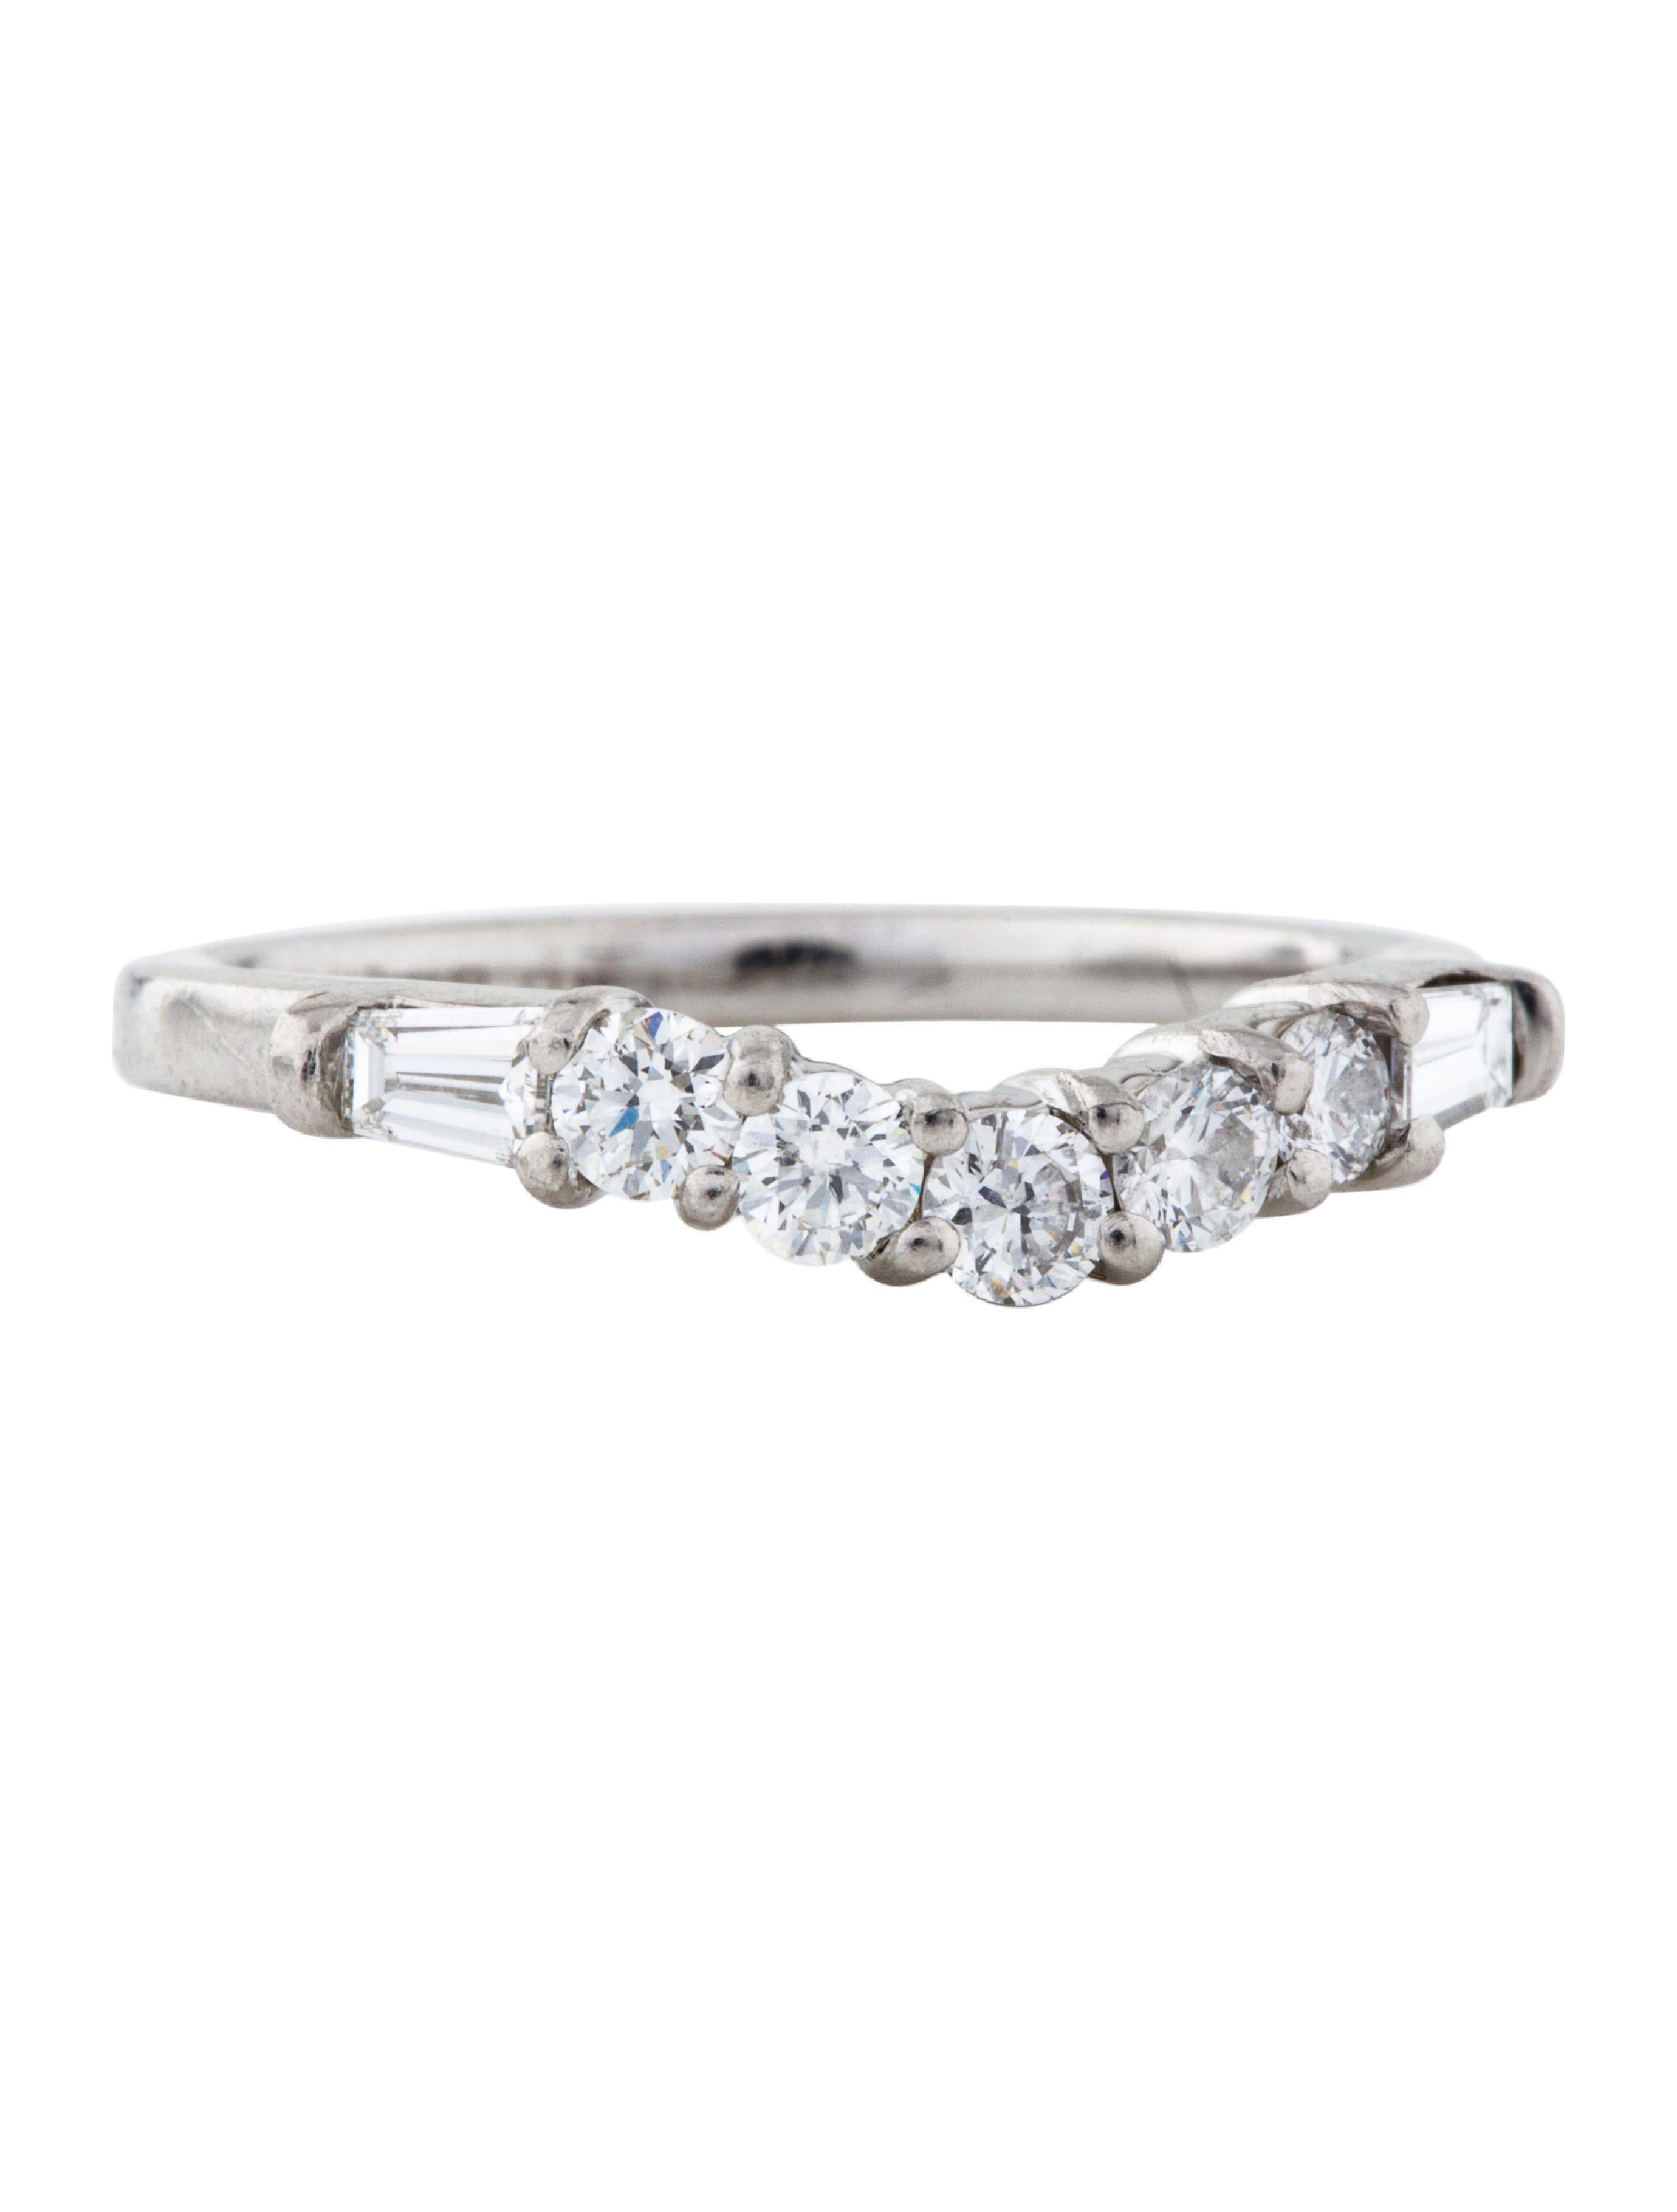 Platinum Diamond Curved Wedding Band Moissanite wedding